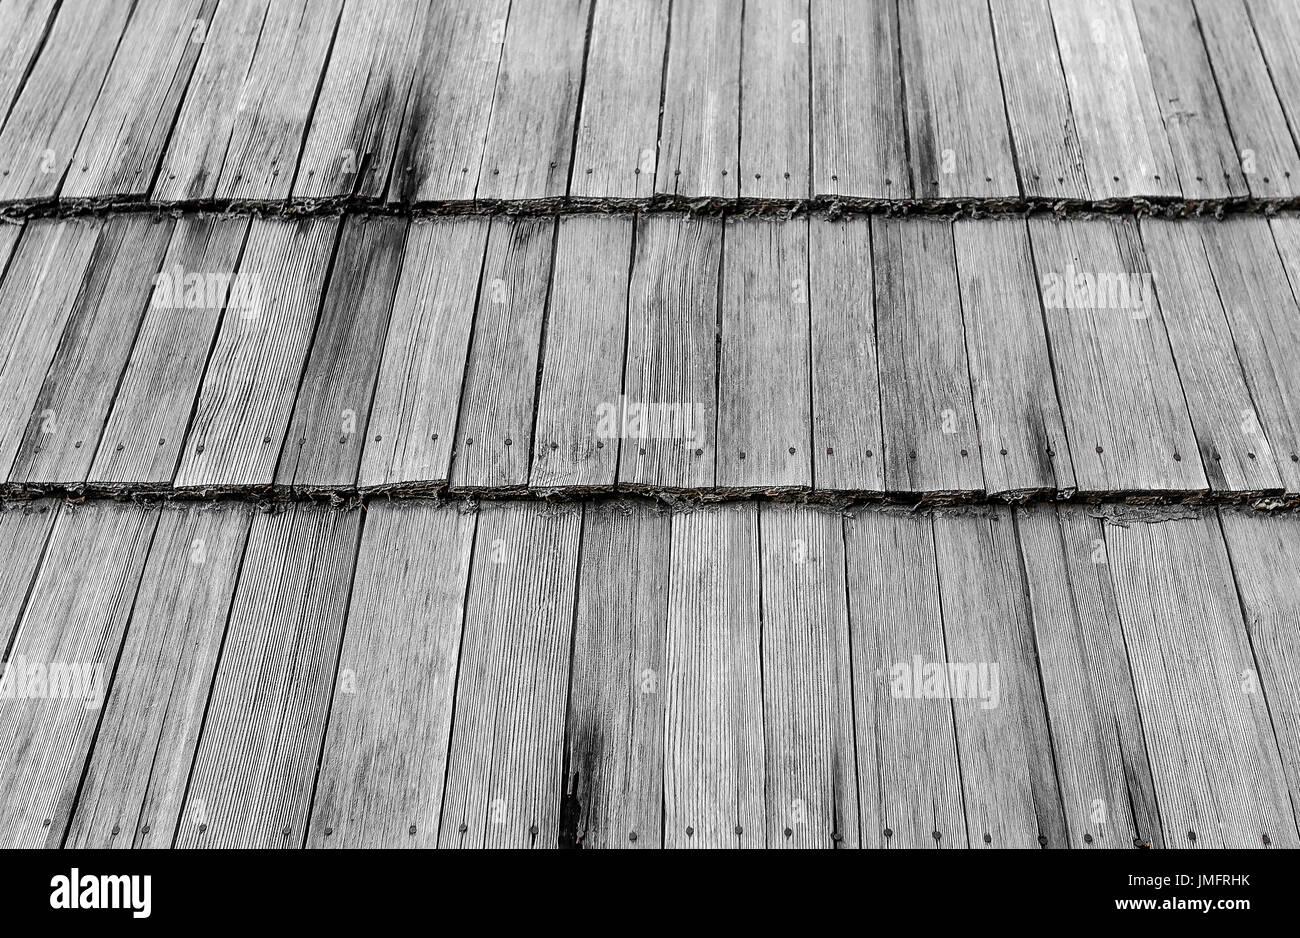 old shingle house stockfotos old shingle house bilder alamy. Black Bedroom Furniture Sets. Home Design Ideas